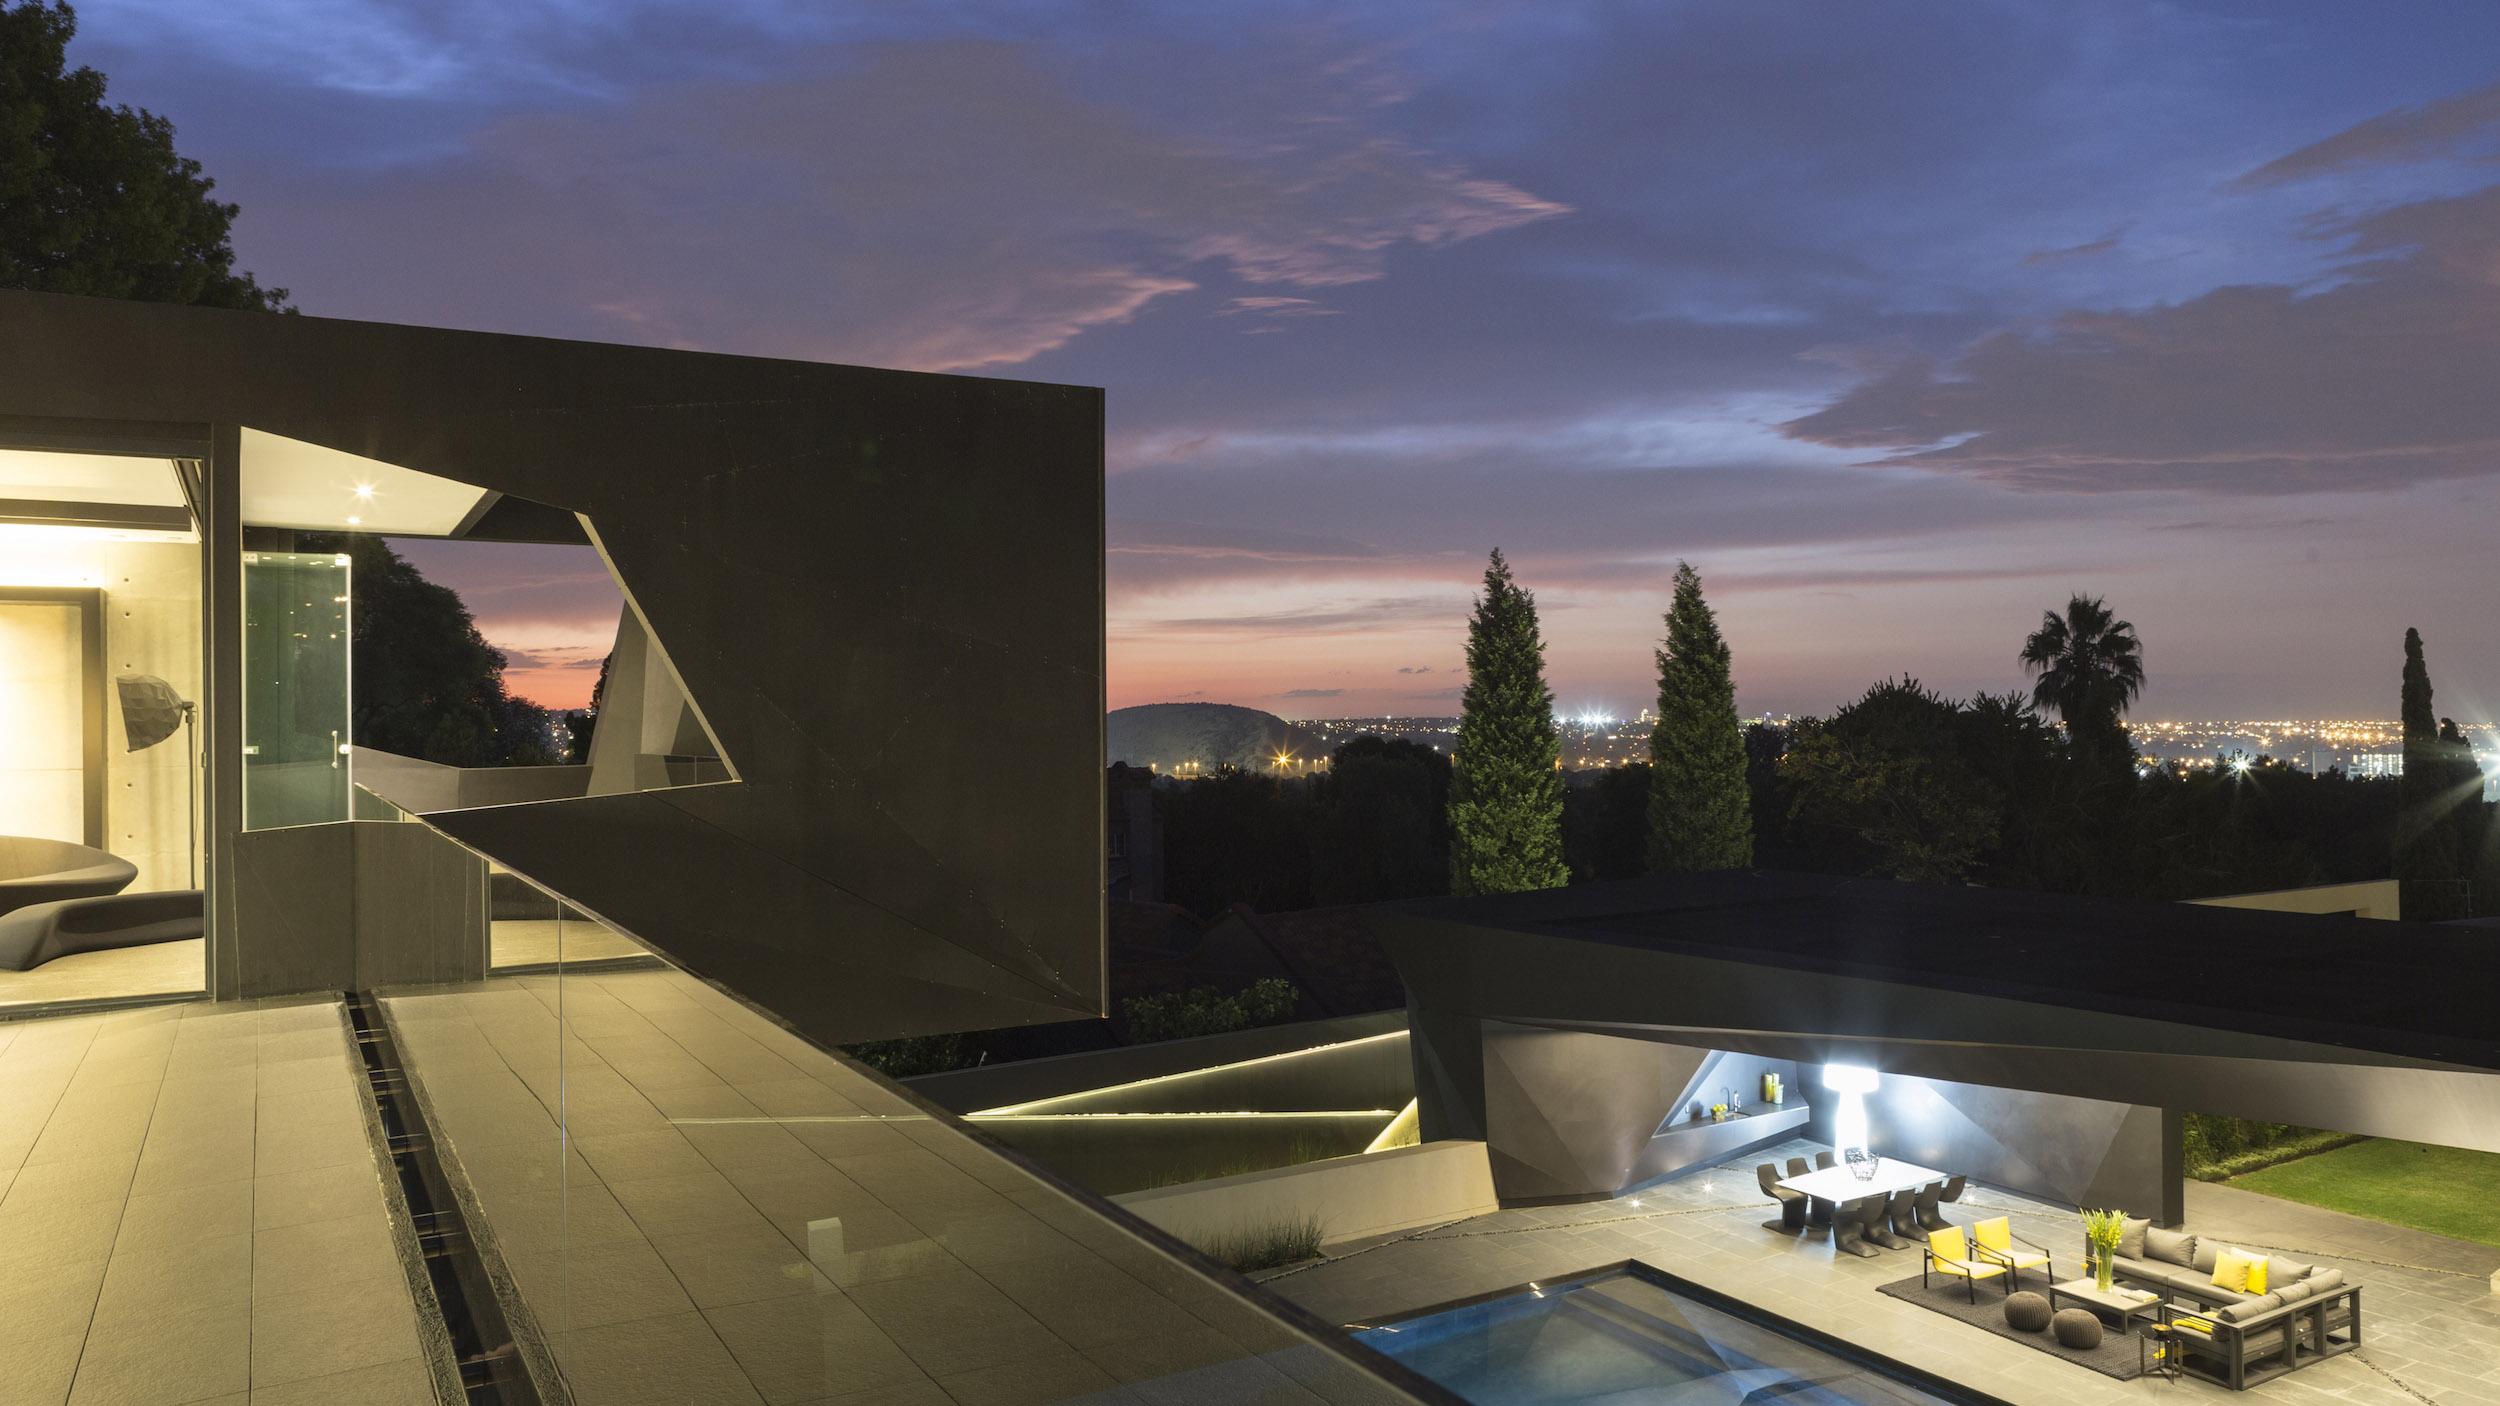 Kloof Road Masterpiece House in Johannesburg by Nico van der Meulen Architects-36